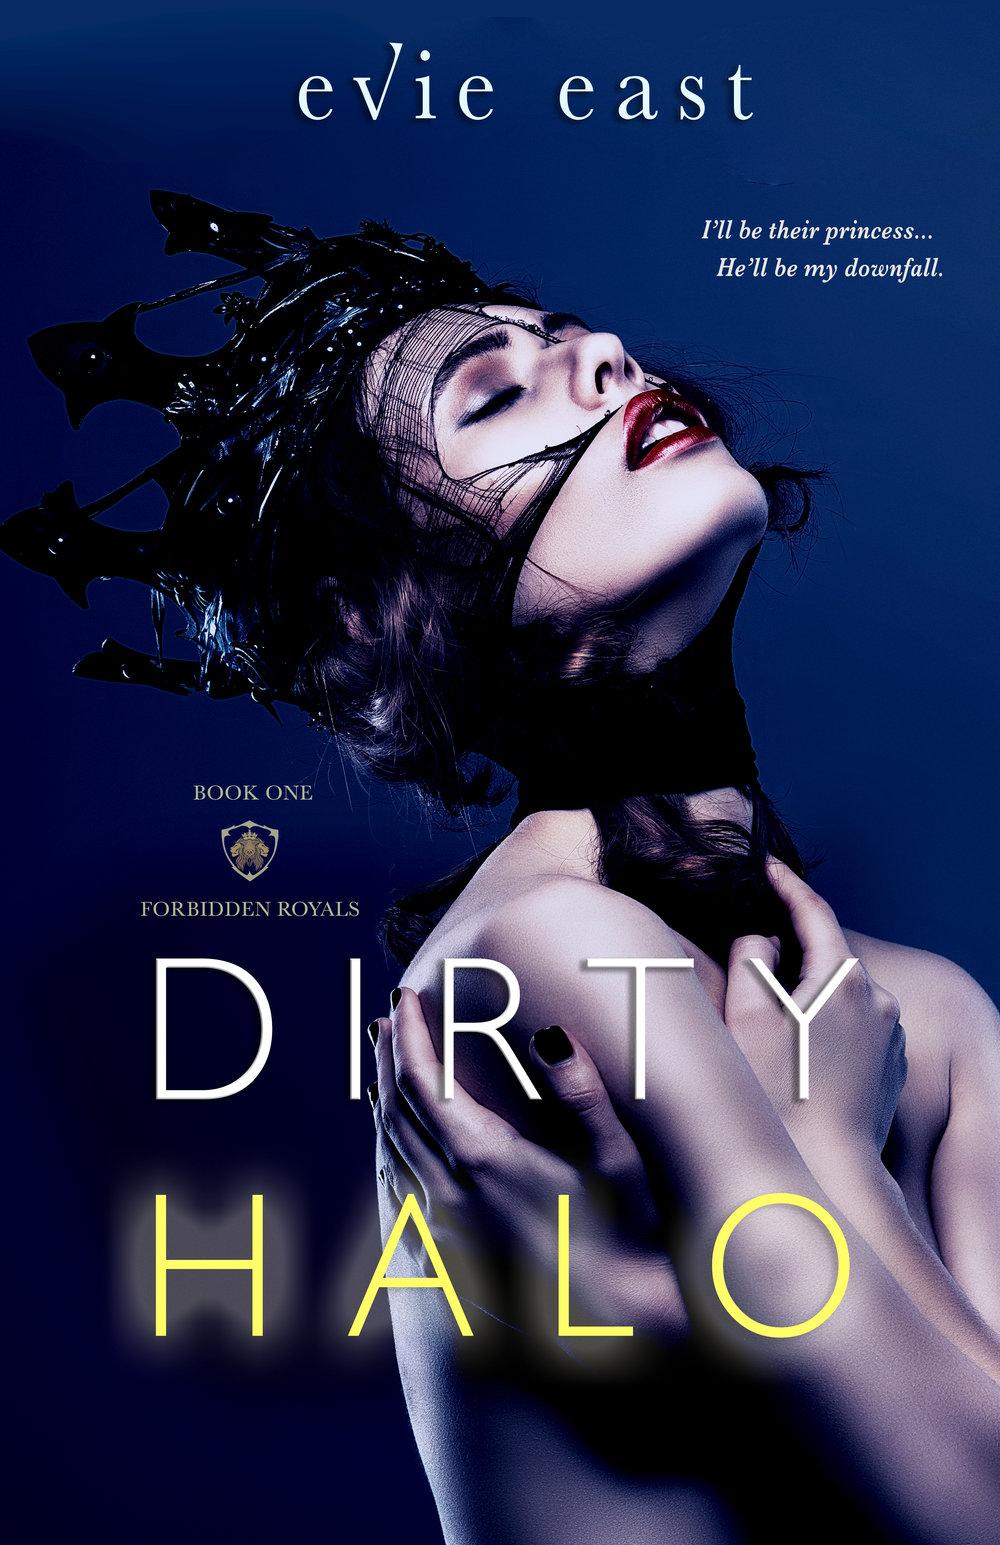 dirty halo final cover V2.jpg